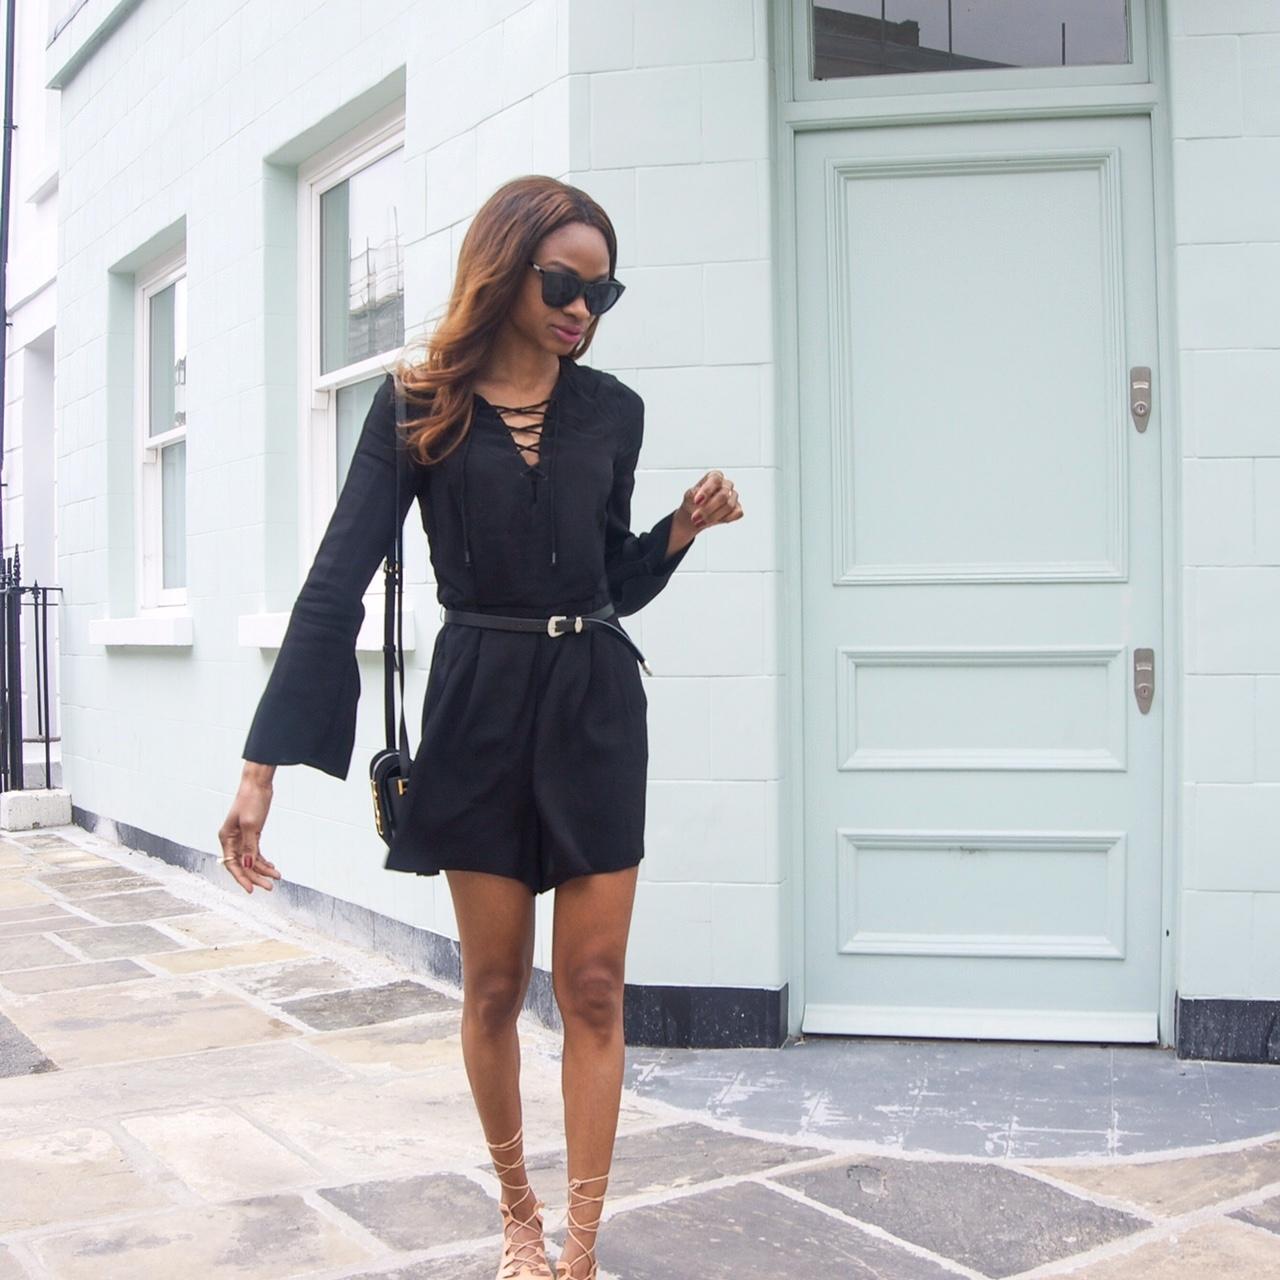 lace up dress street style 1